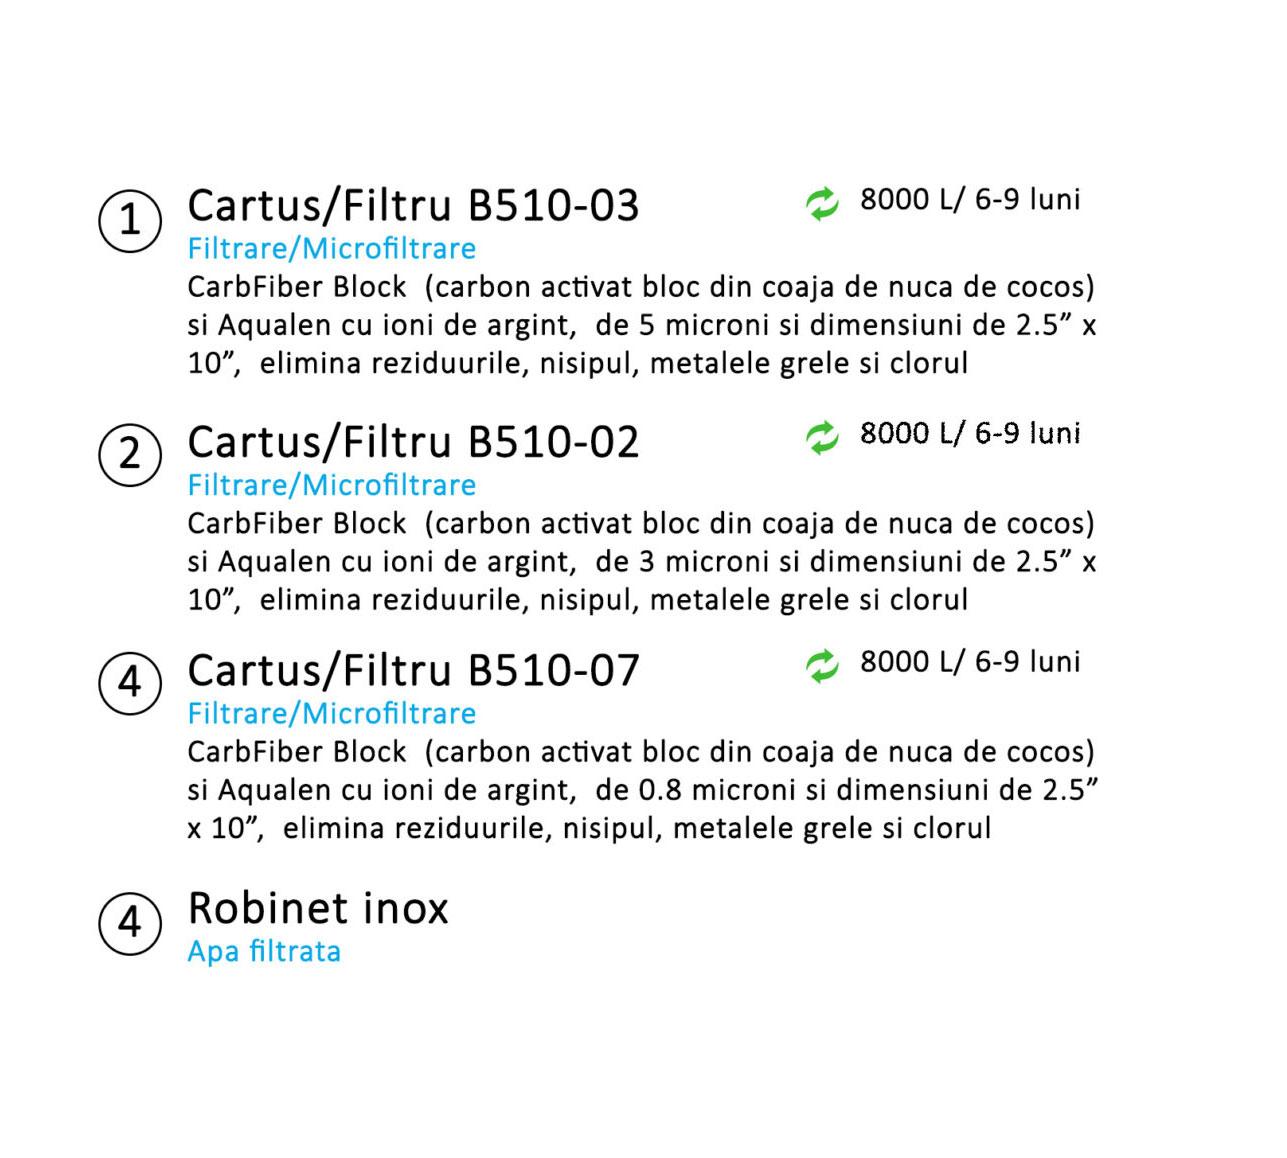 sistem-de-filtrare-in-3-pasi-aquaphor-trio-norm-2-mfrh-original-scaled-B